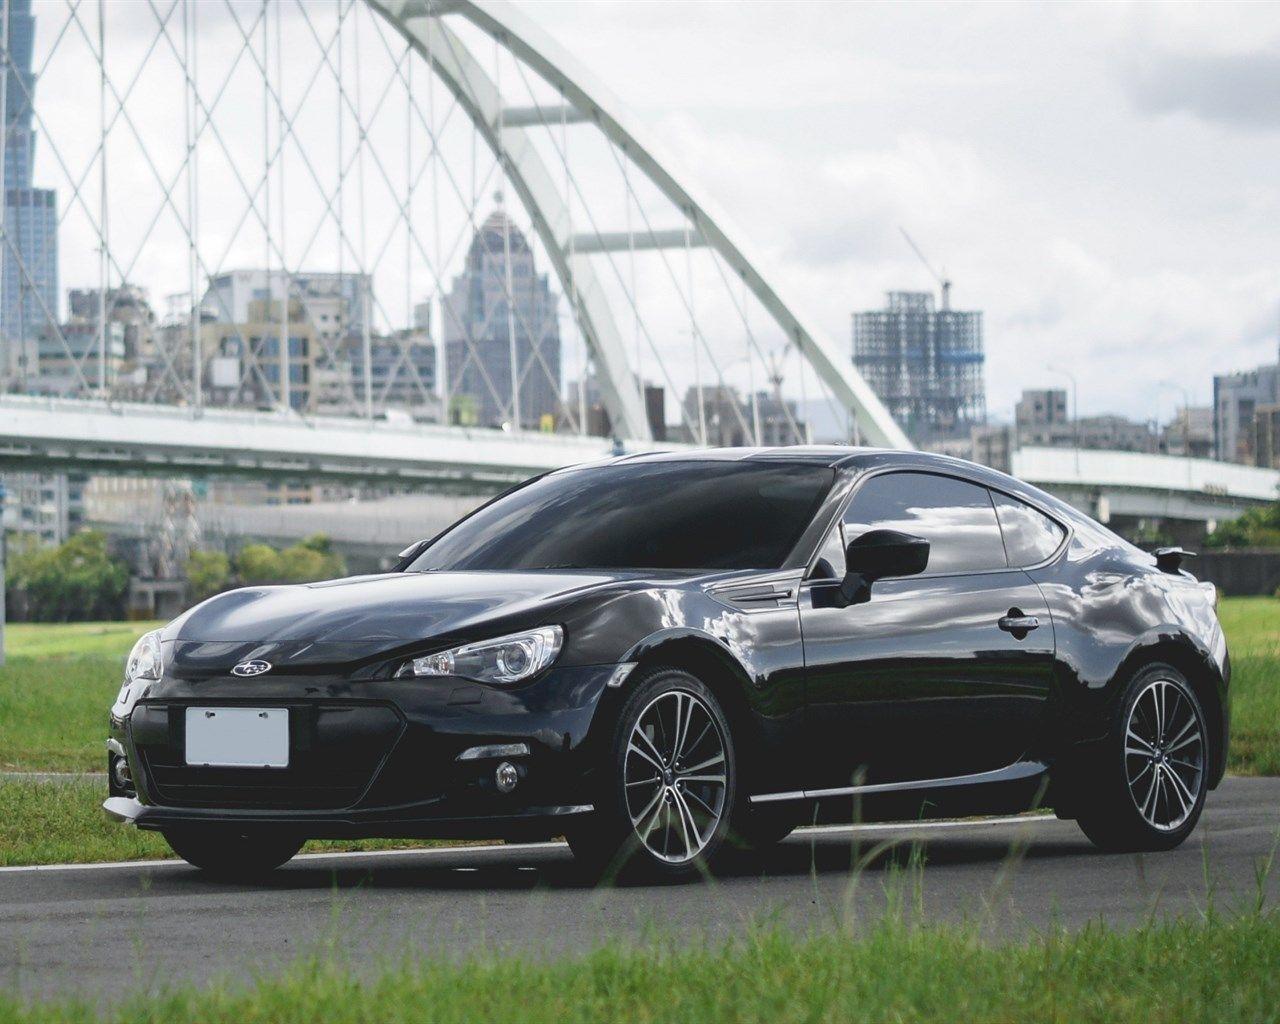 Subaru BRZ 2017 Black Sports Coupe Japanese Cars